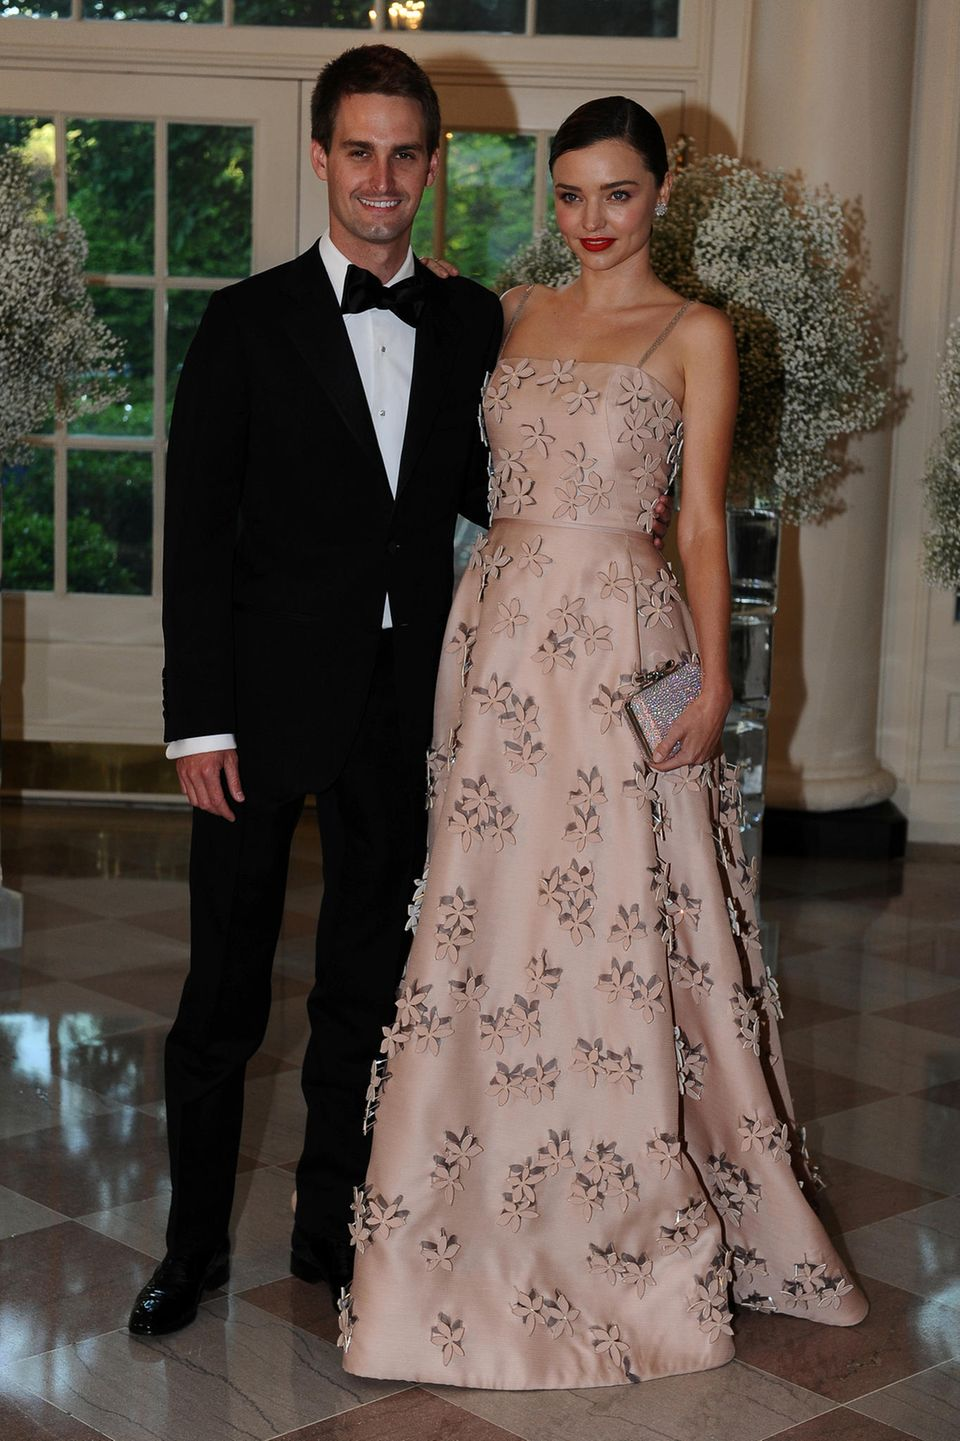 Evan Spiegel + Miranda Kerr